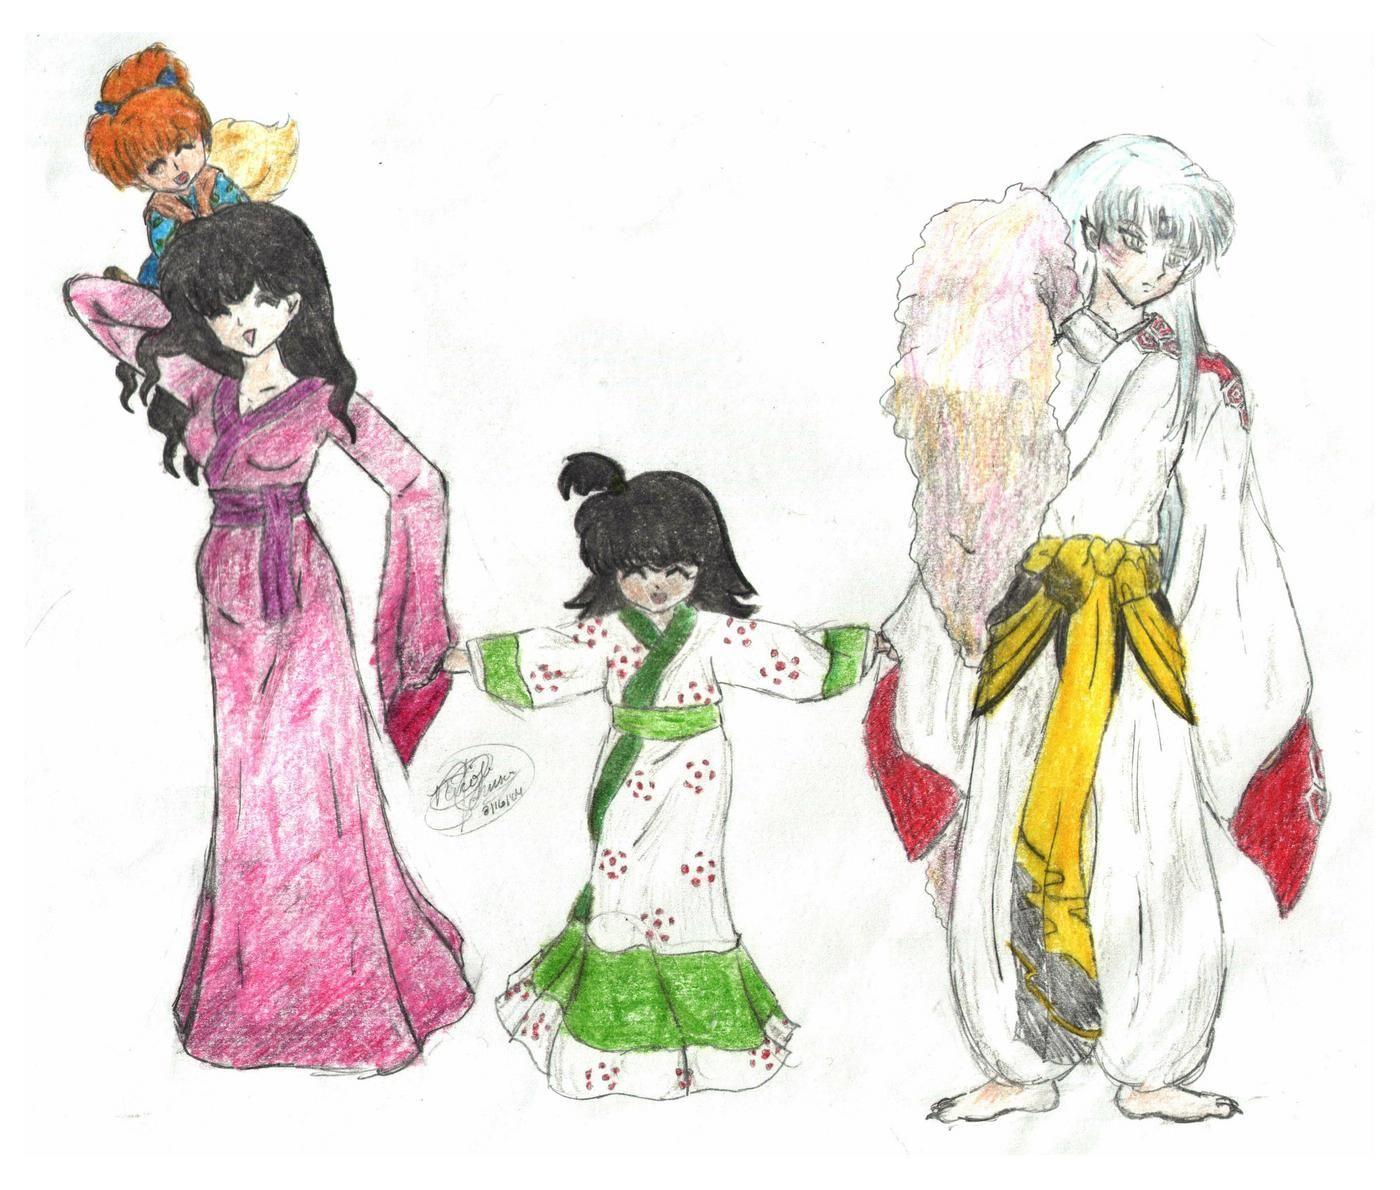 sesshomaru+and+kagome+mate | Sesshoumaru family by Chibuka